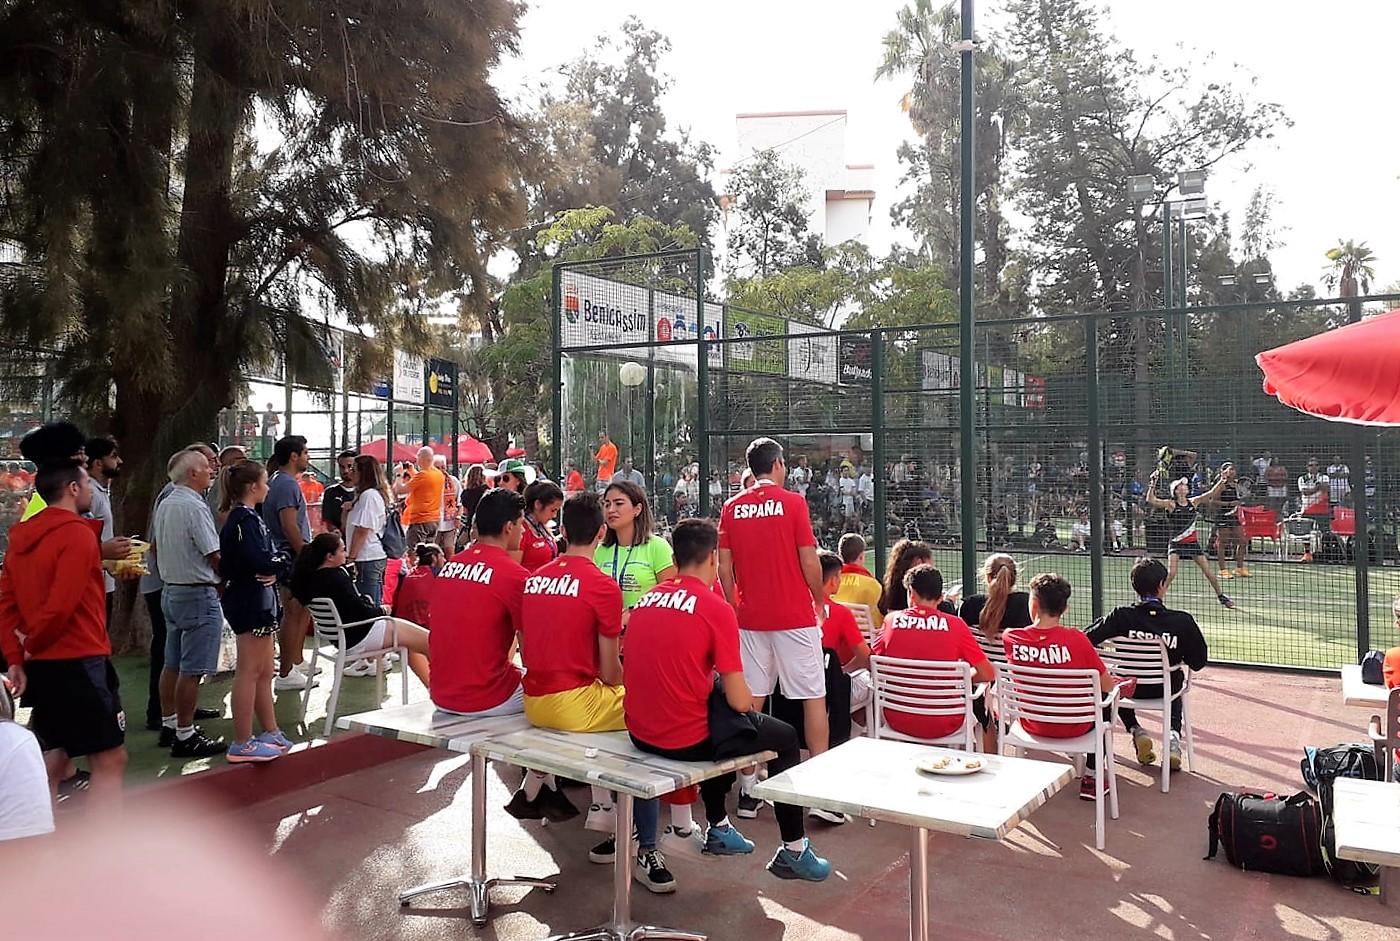 Campeonato Francês Interligue Juvenil Padel em Toulouse Padel clube